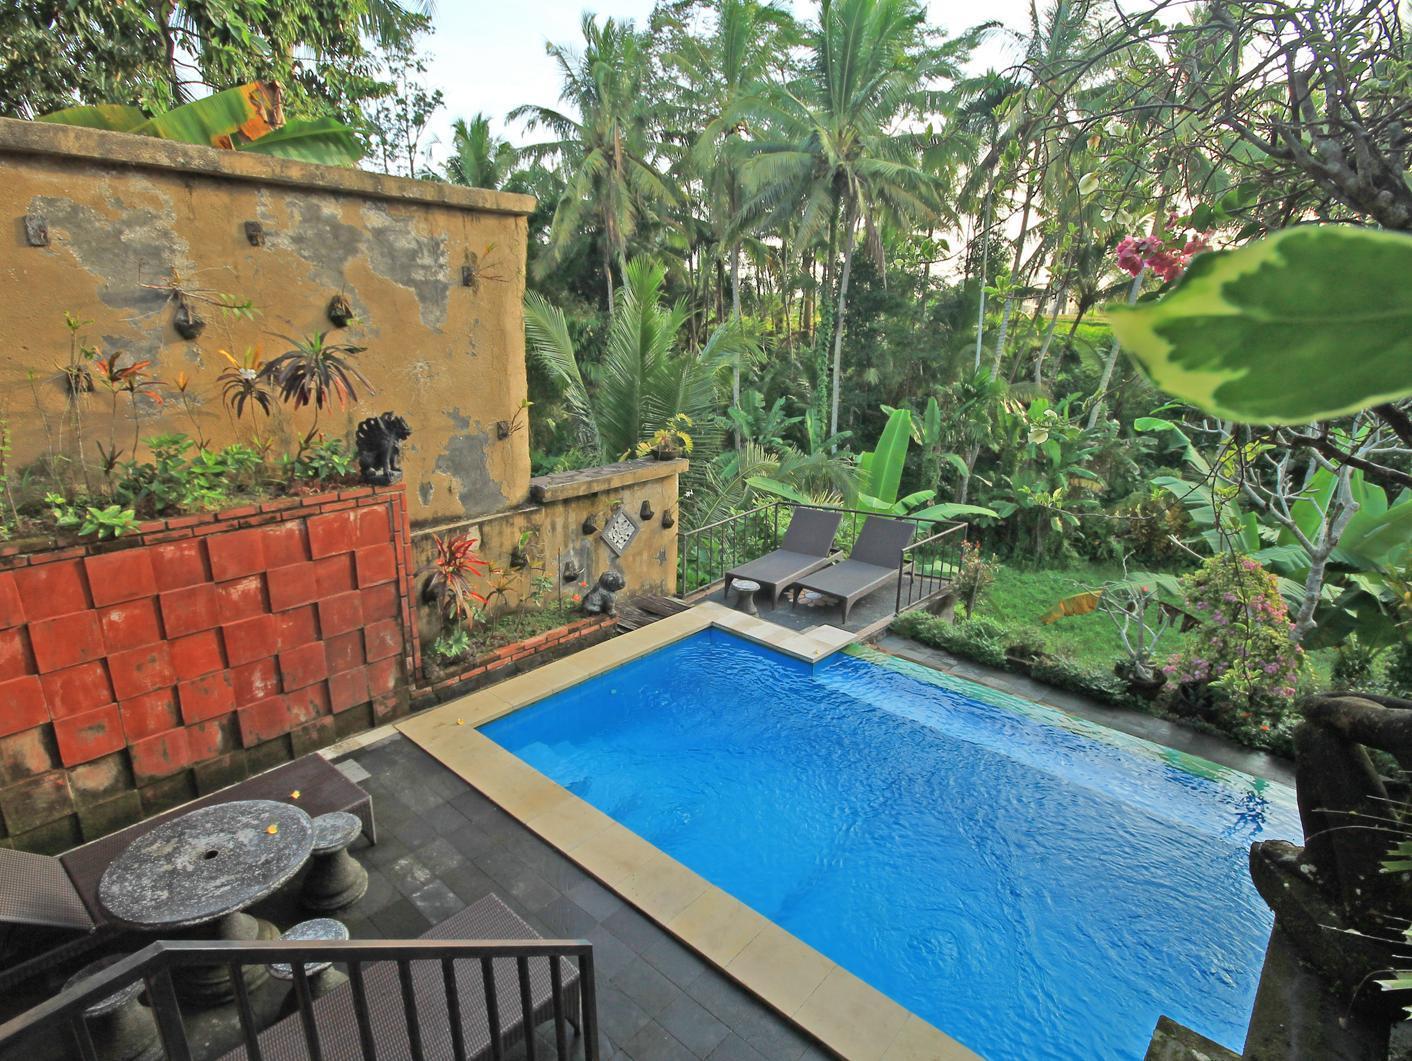 Deta Junjungan Rice Field Villa